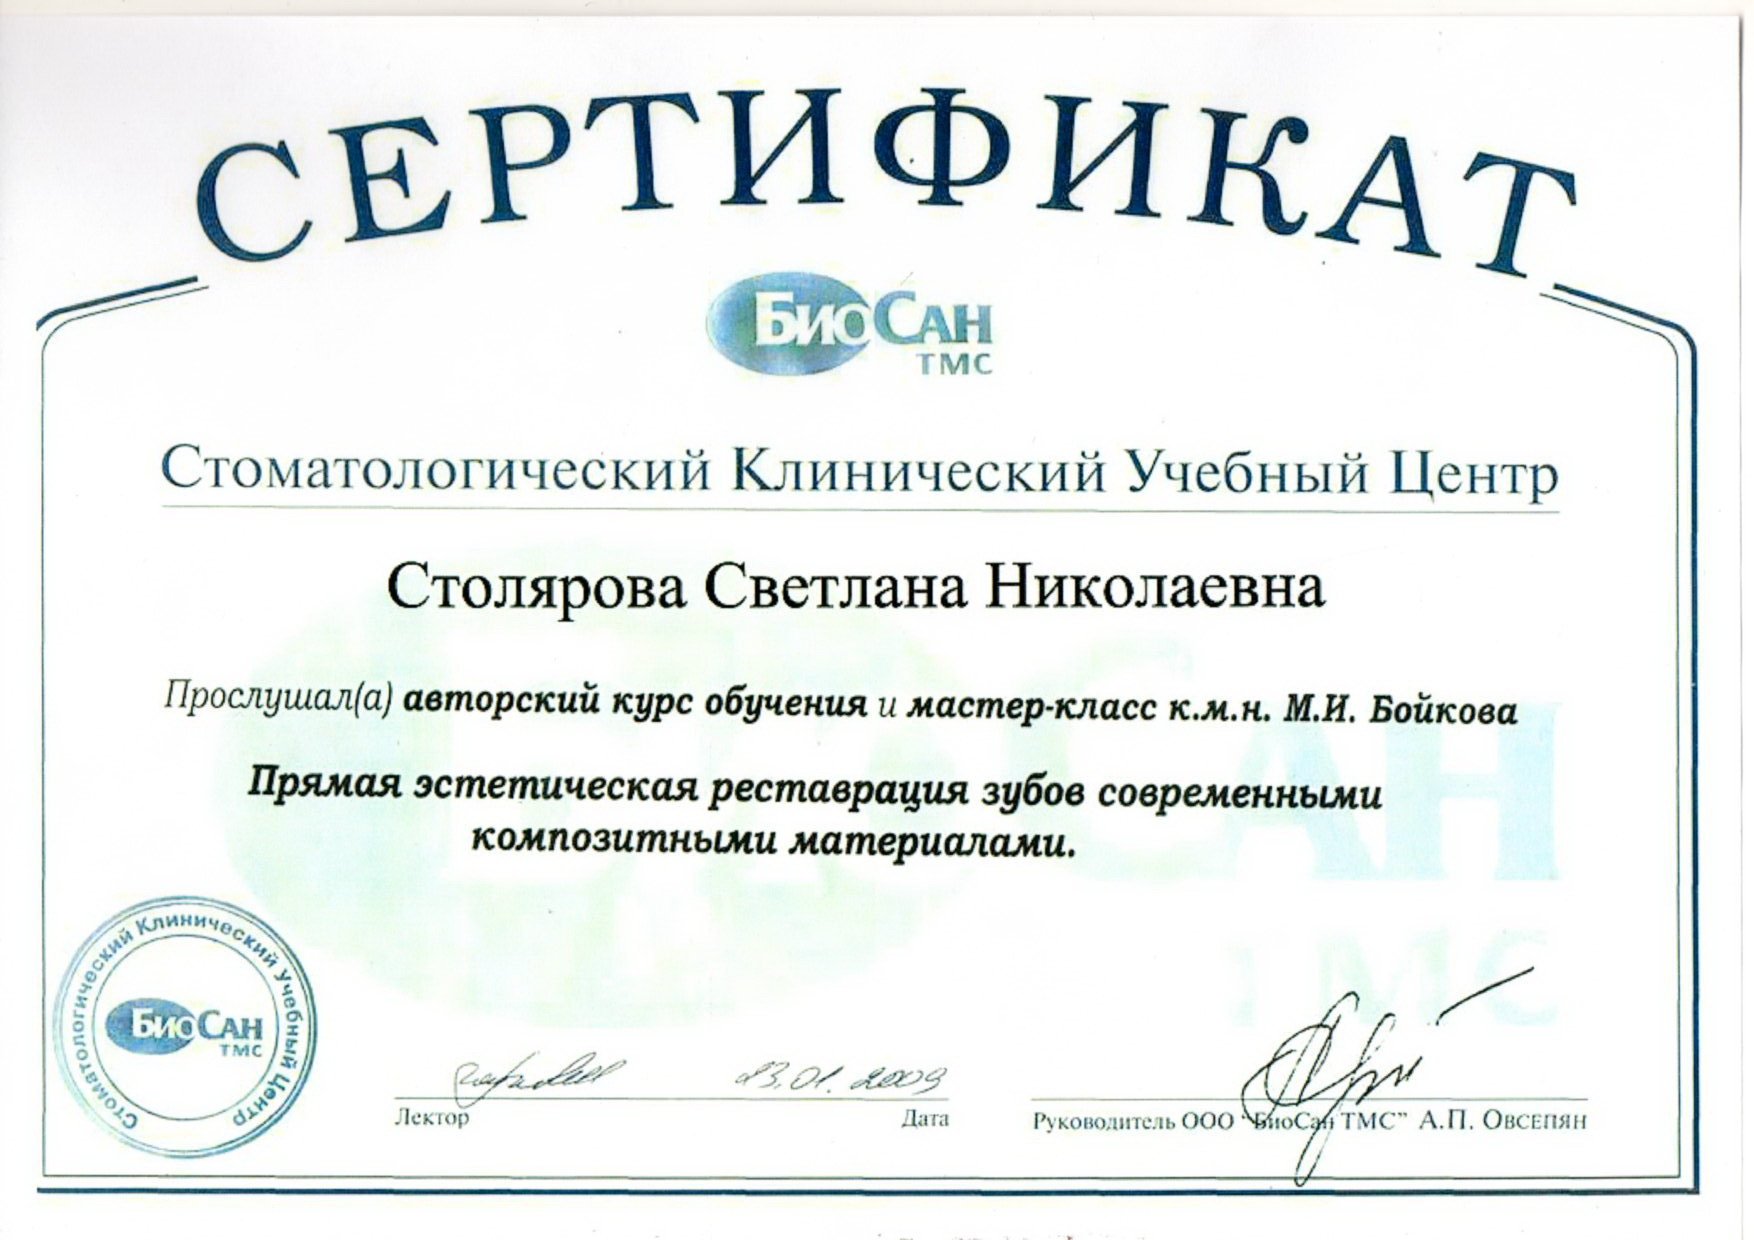 Столярова Светлана Николаевна - Сертификат